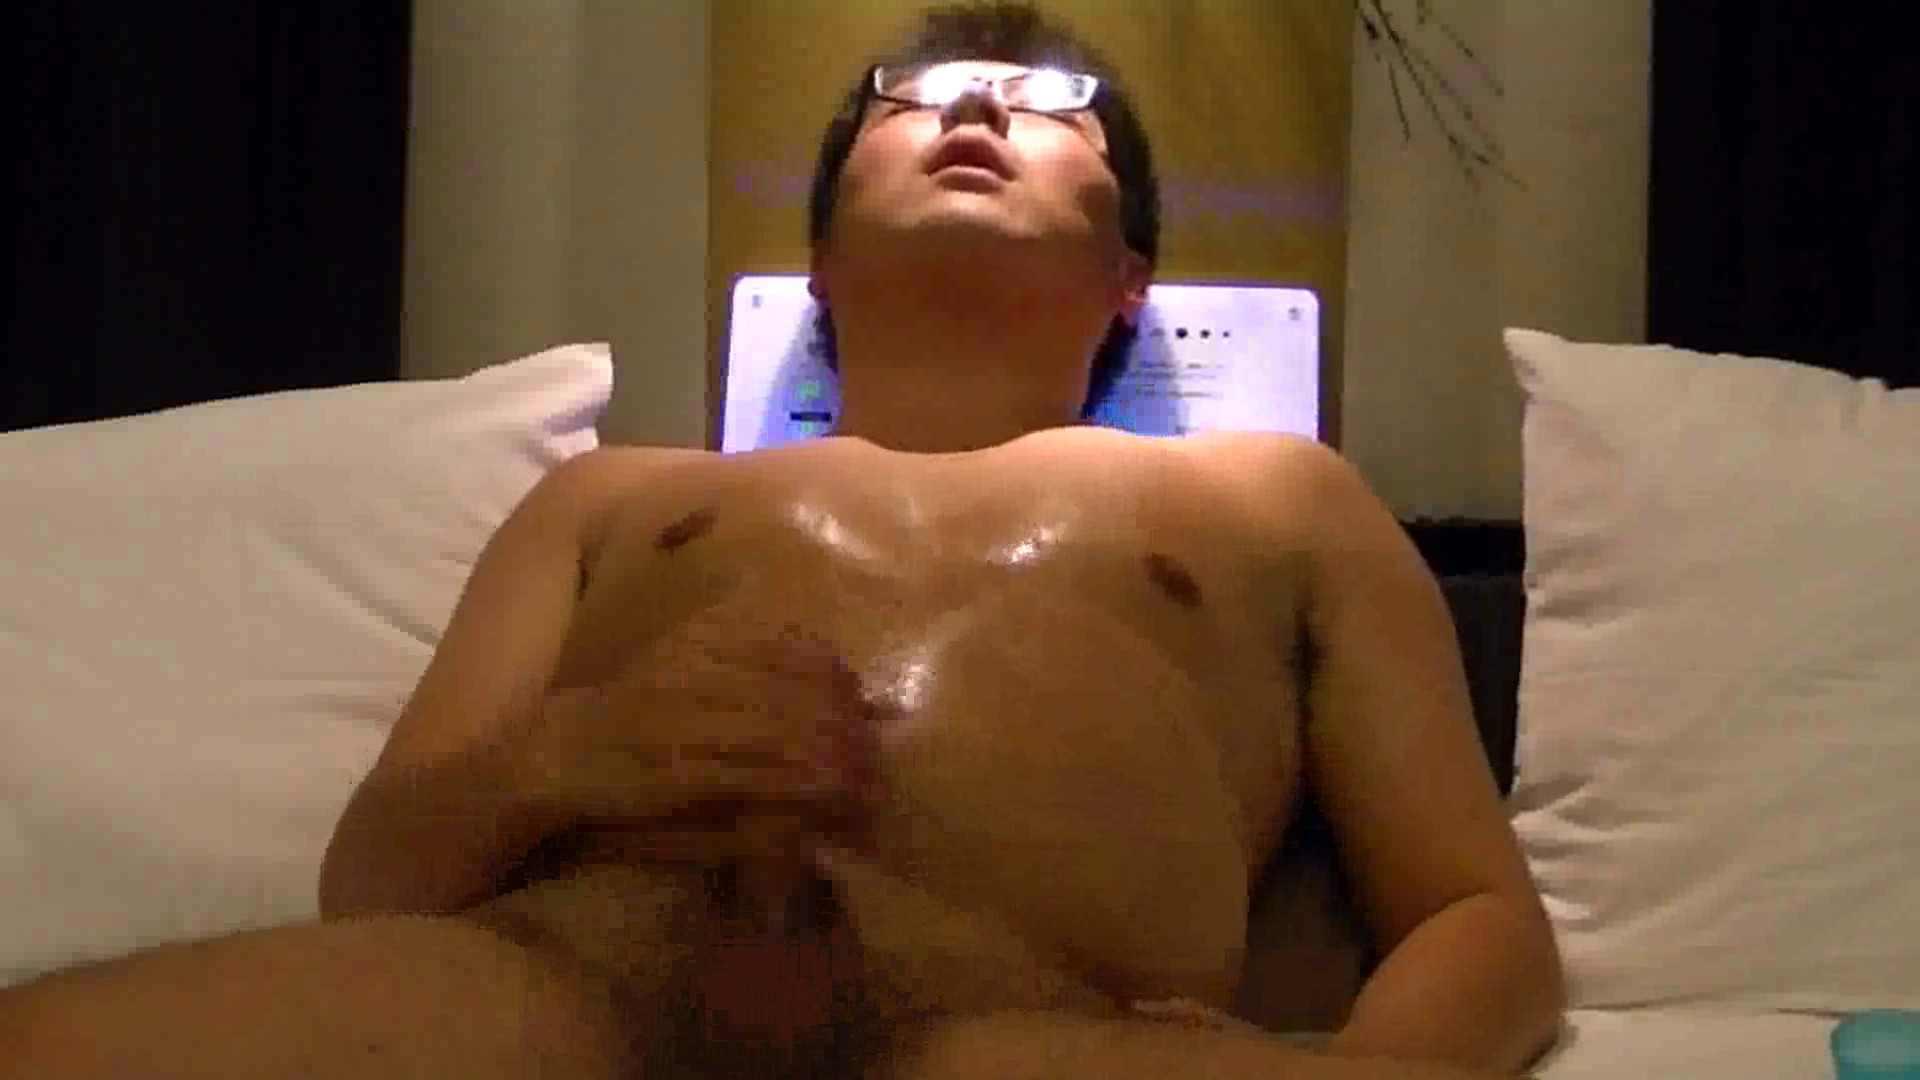 ONA見せカーニバル!! Vol5 エッチ ゲイ無修正ビデオ画像 108枚 68